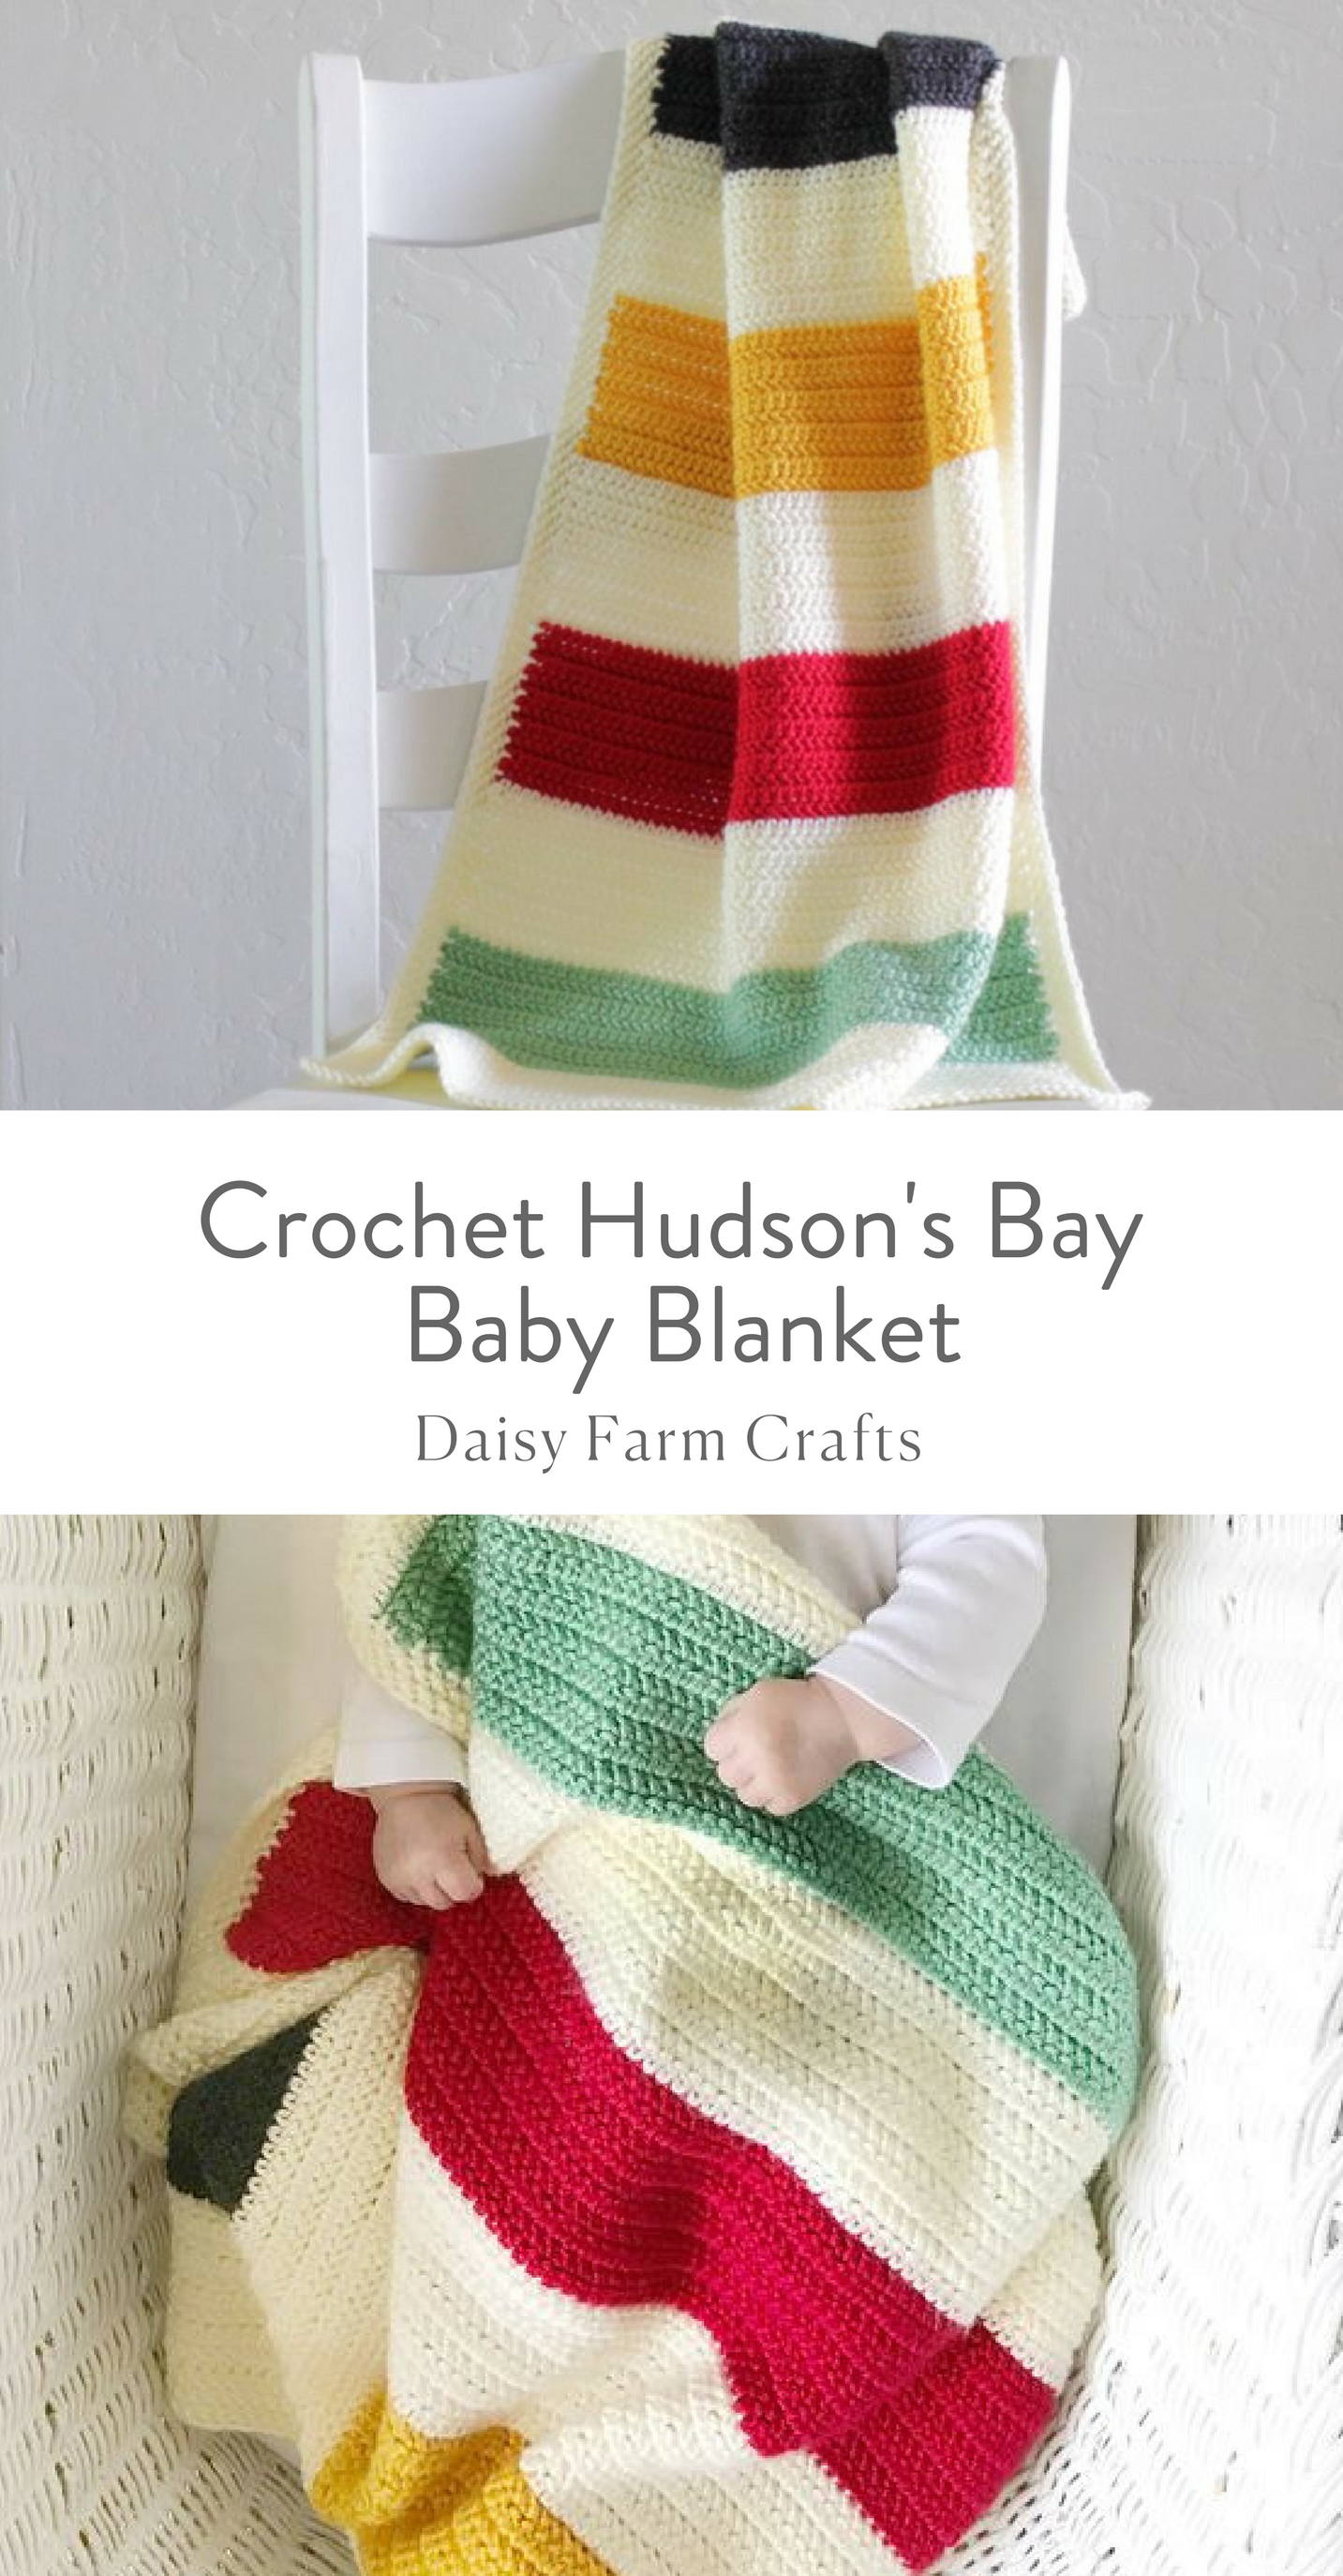 Free Pattern - Crochet Hudson\'s Bay Baby Blanket | Crafts ...